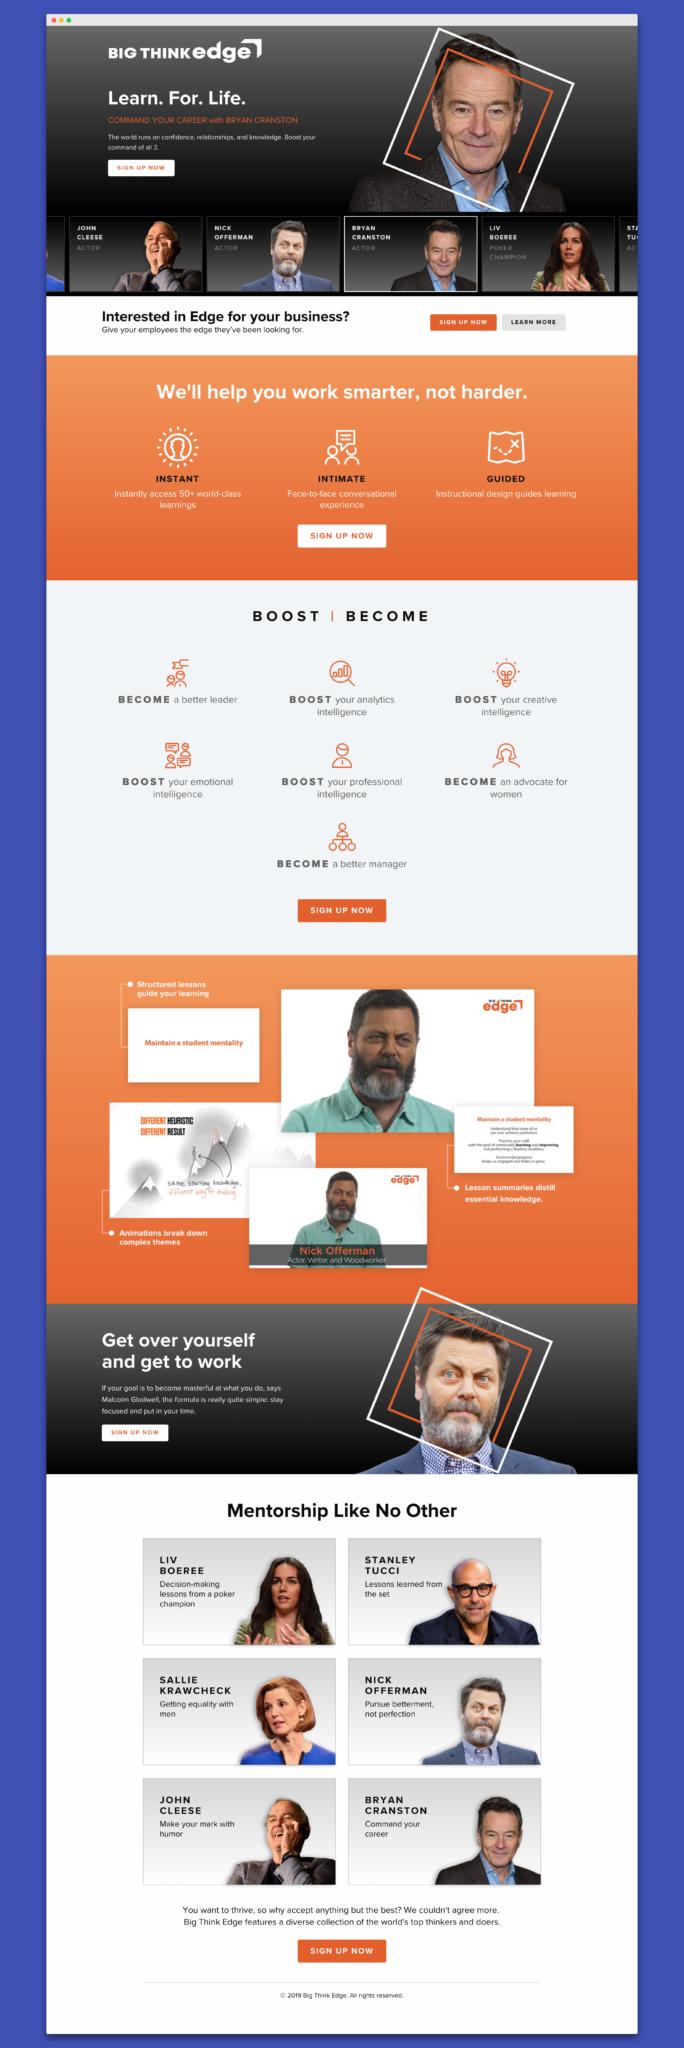 Big Think B2C redesign